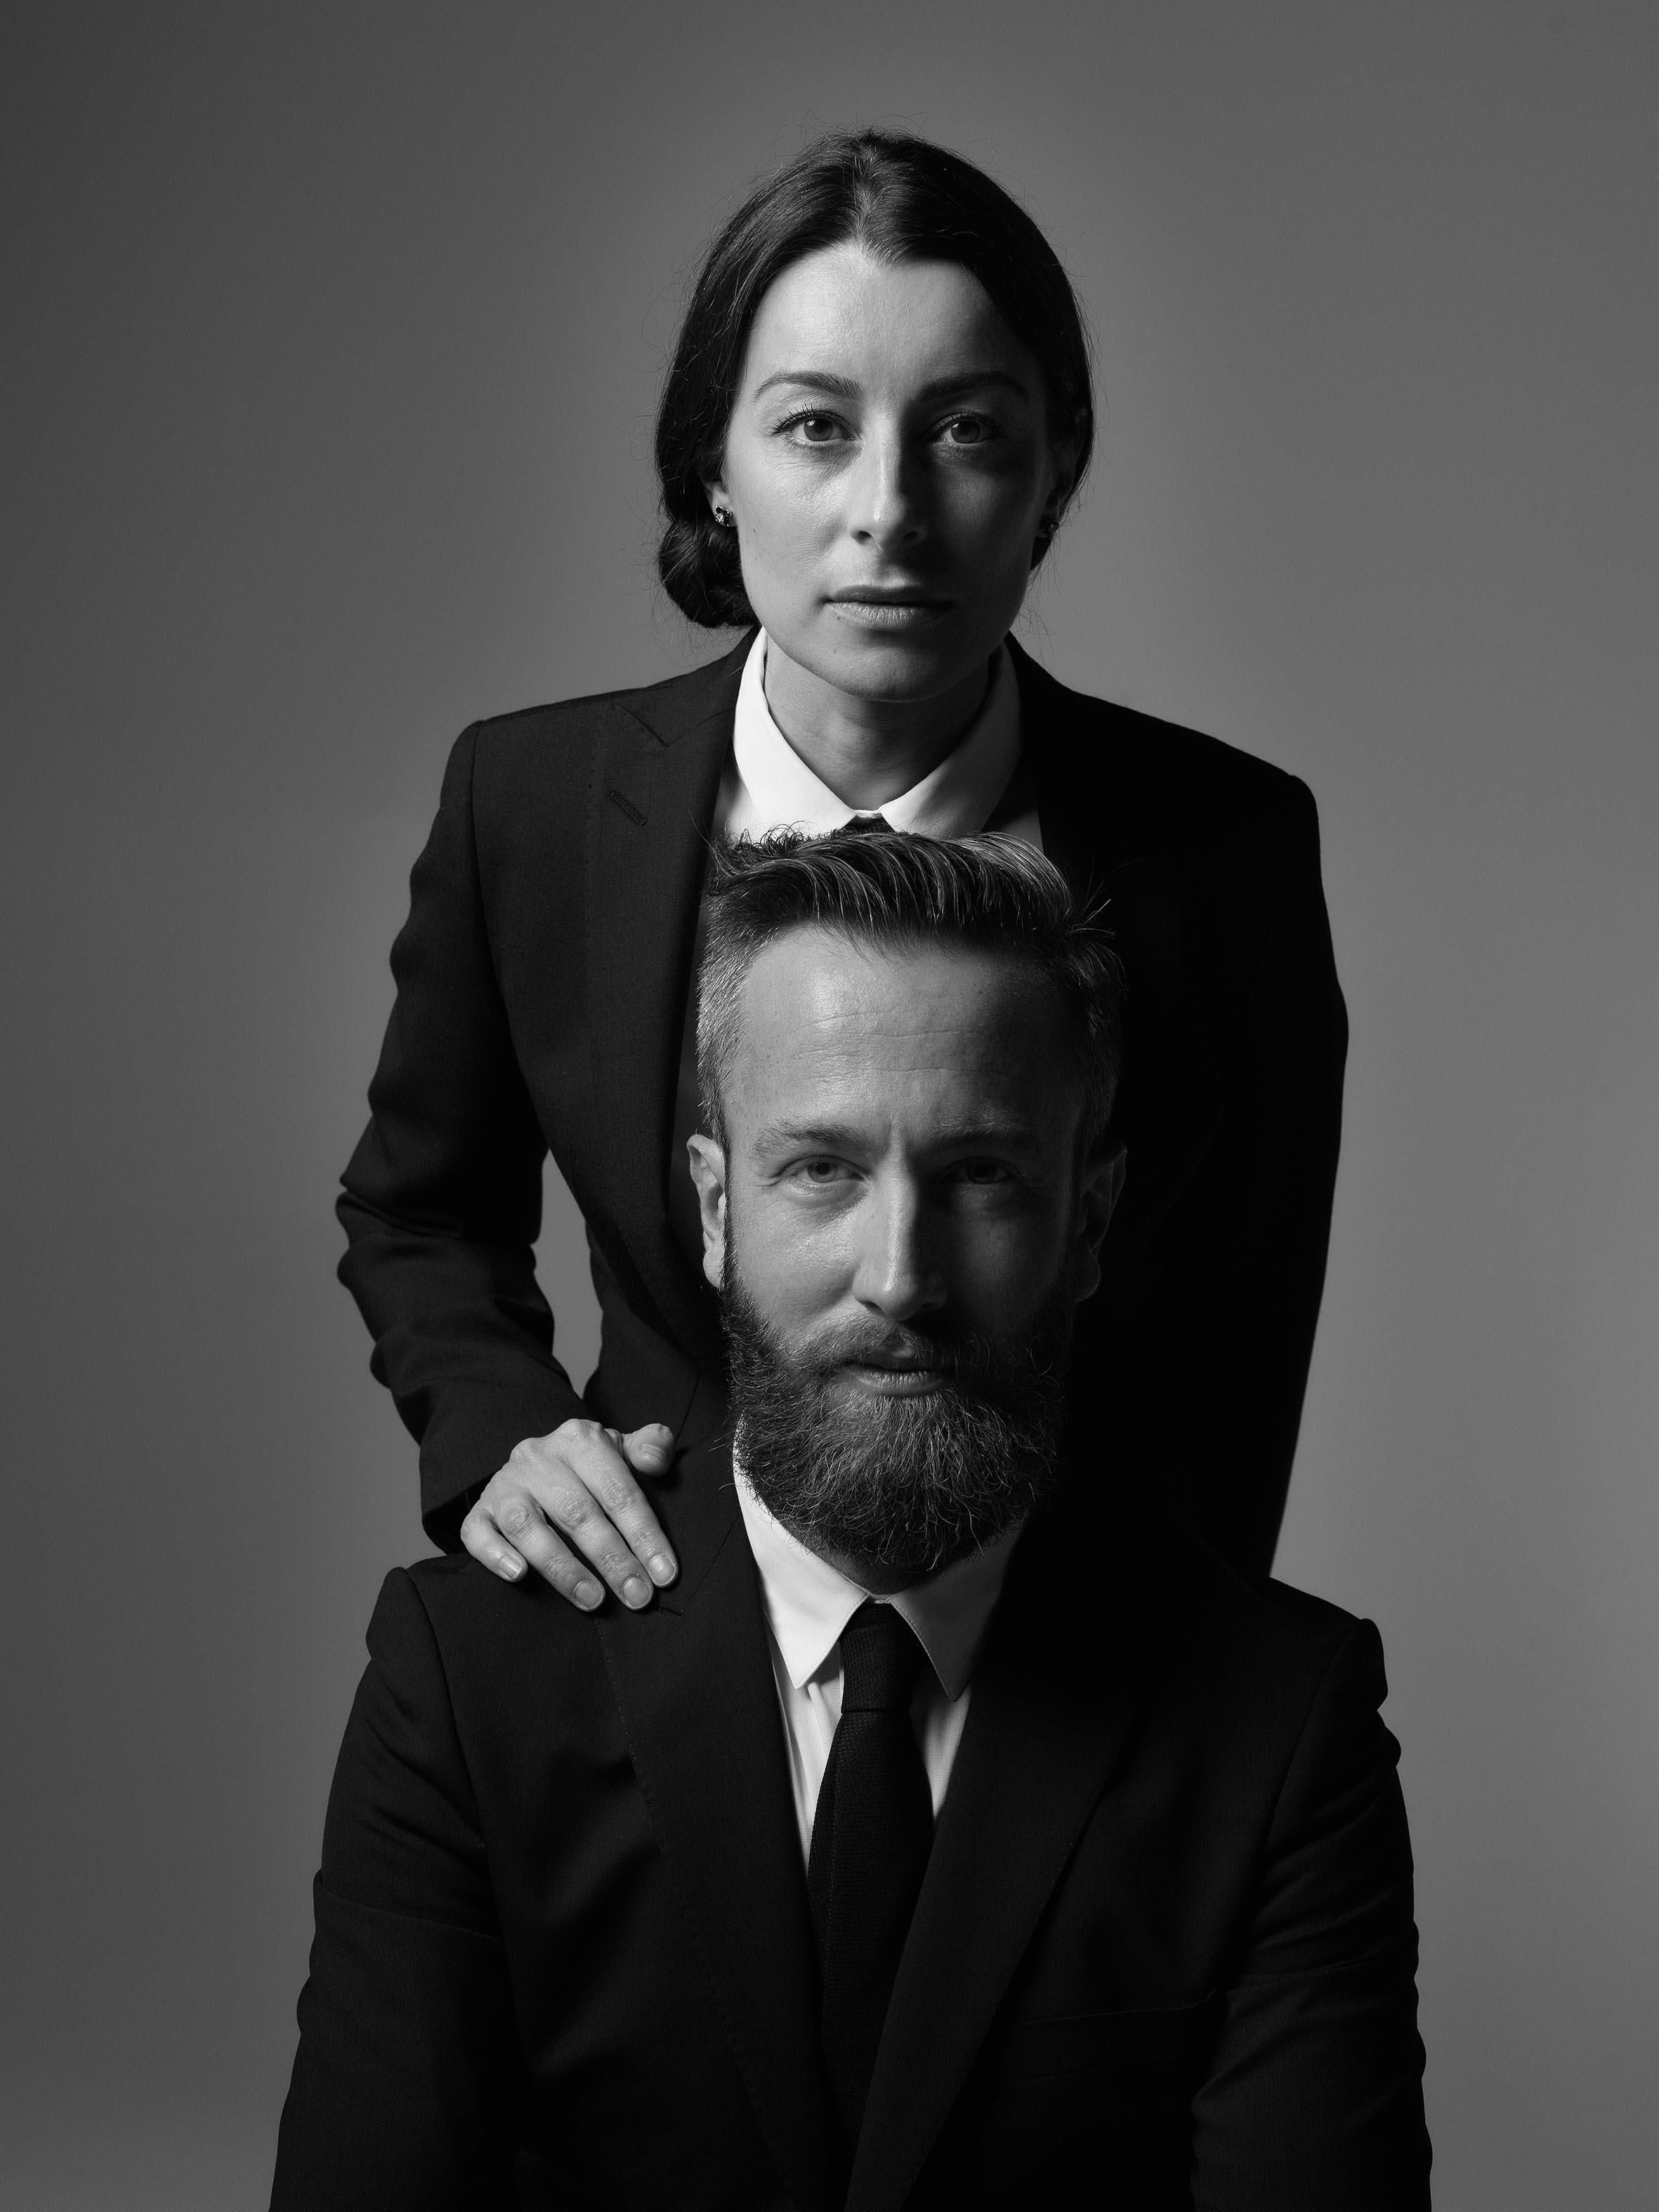 Cinzia Cumini and Vicente Garcìa Jiménez are Garcia Cumini, the multi-disciplinary design studio based in Udine, Italy.